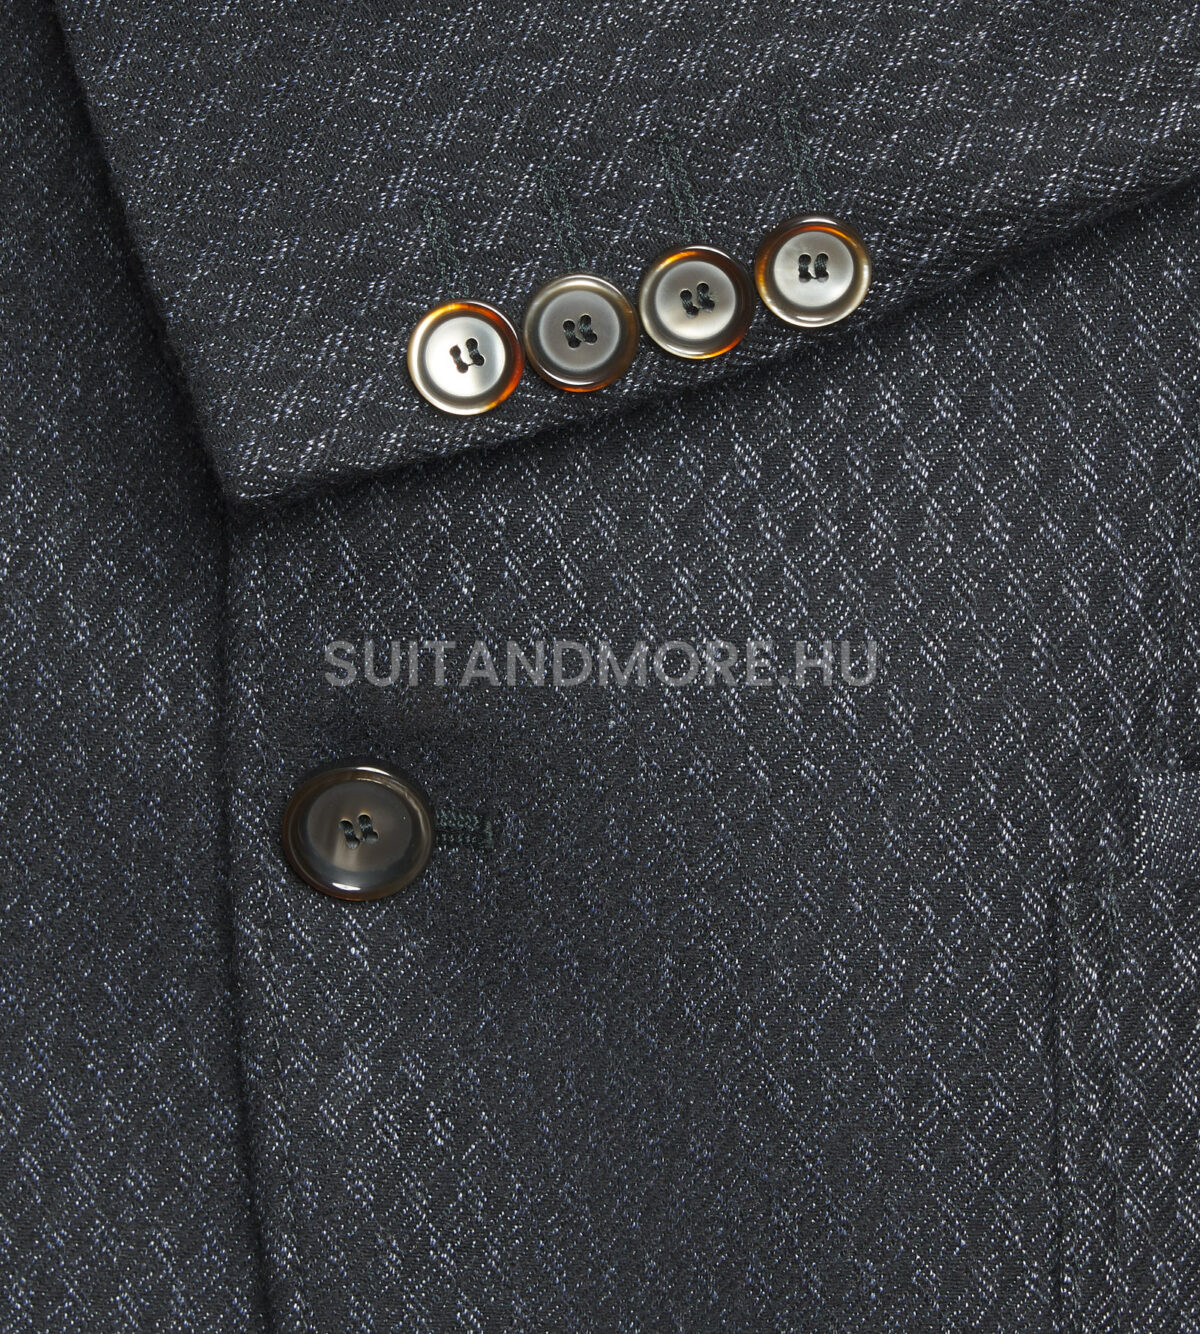 digel-sotetkek-slim-fit-rombuszmintas-gyapju-kevert-zako-ares-1262468-22